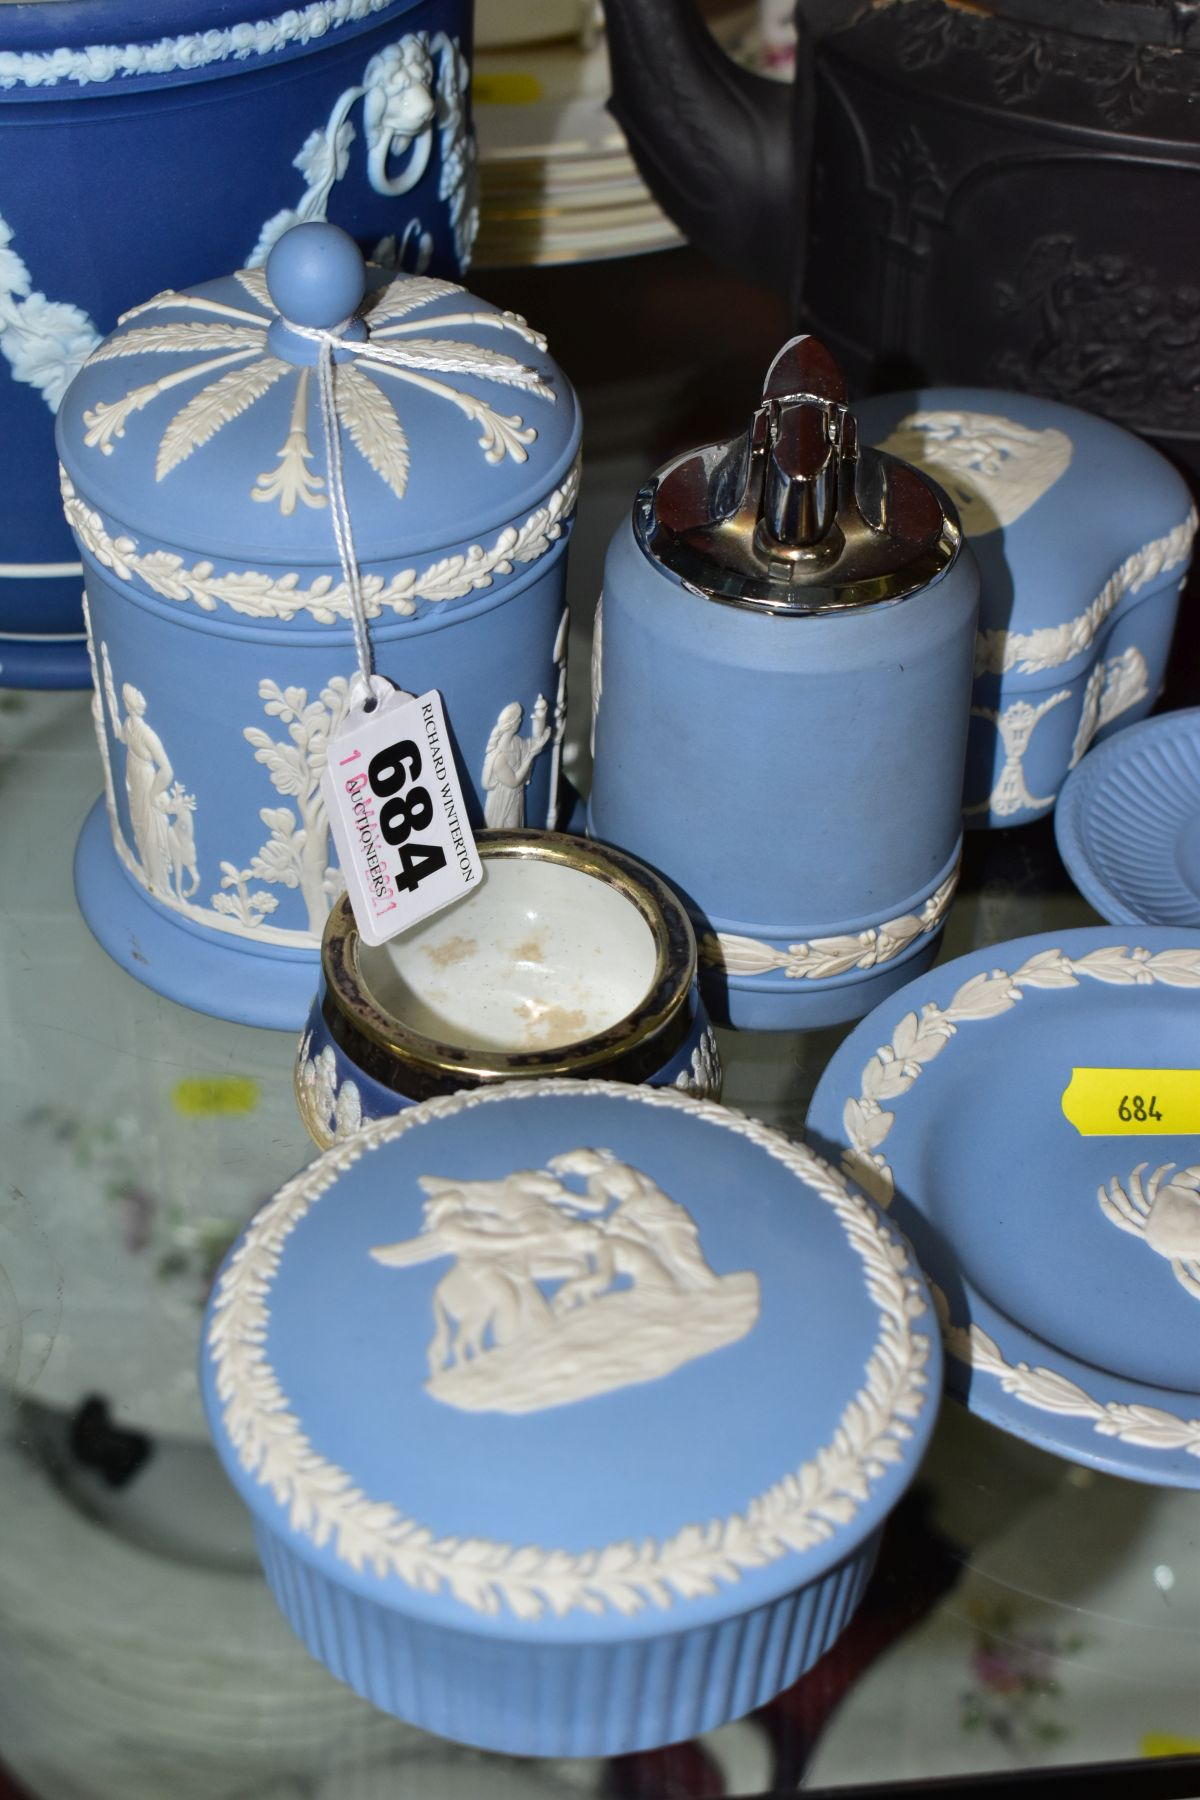 CERAMICS to include blue jasper ware trinkets, etc, Wedgwood Clio clock, black basalt teapot with - Image 4 of 8